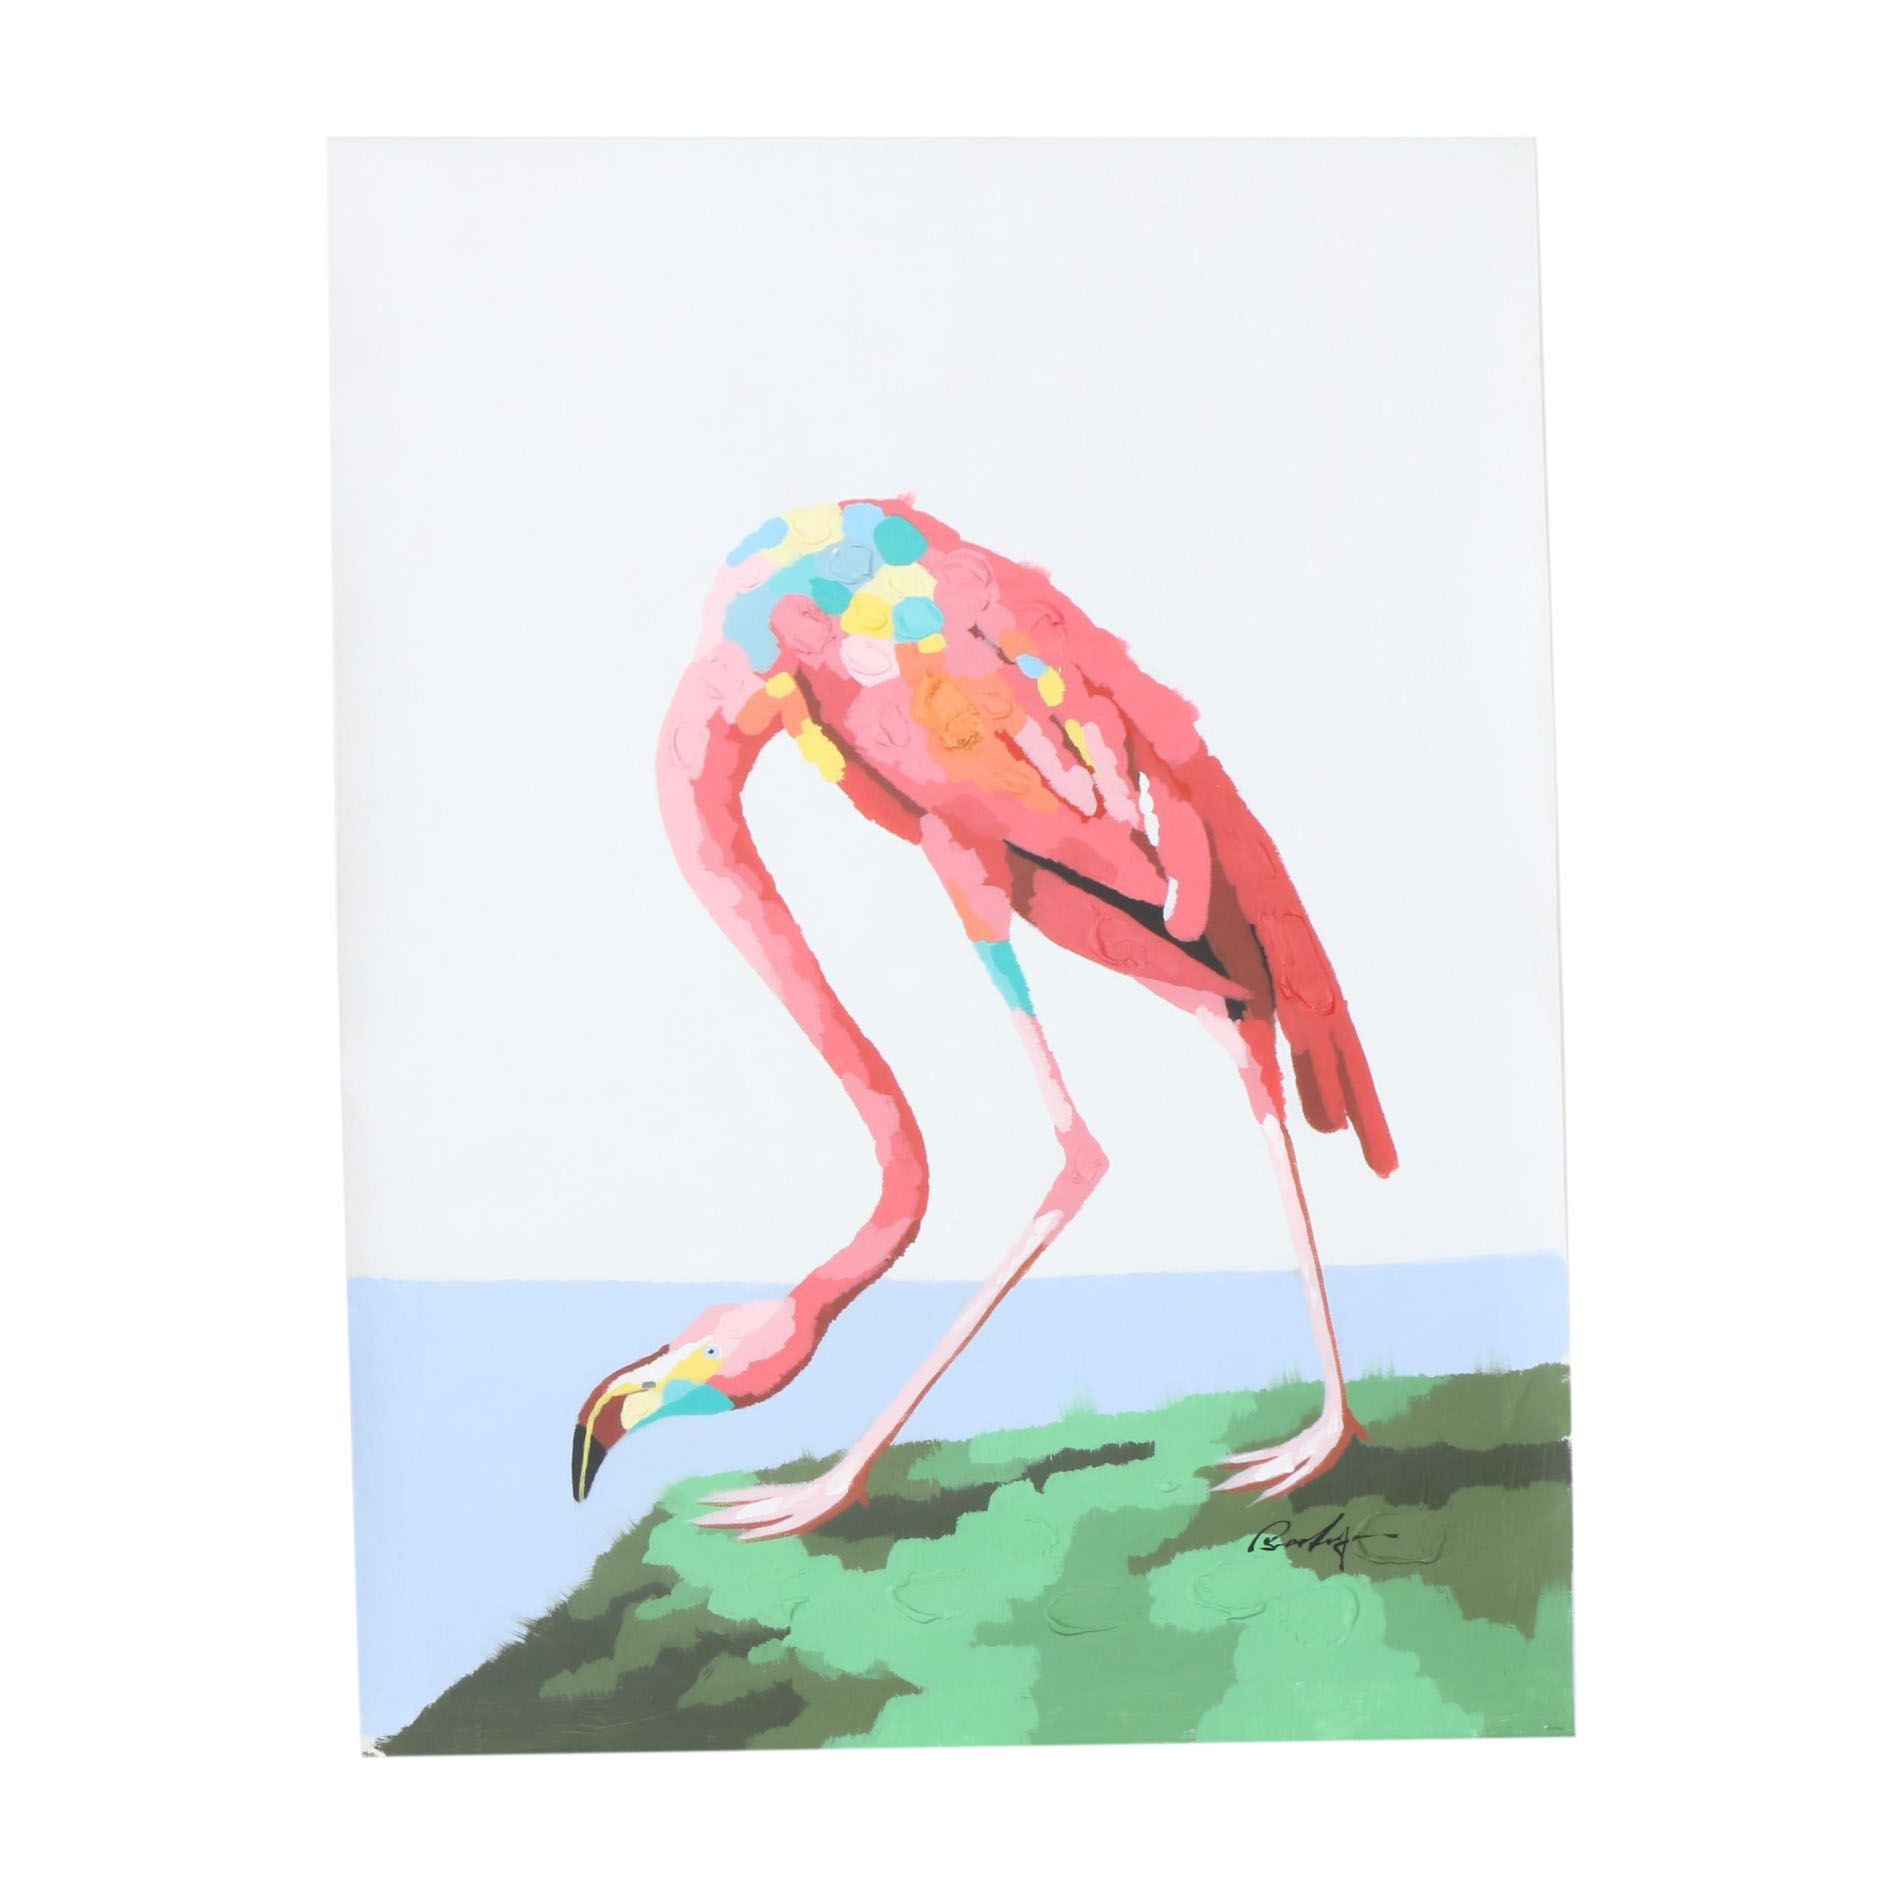 Abstract Mixed Media Painting of Flamingo